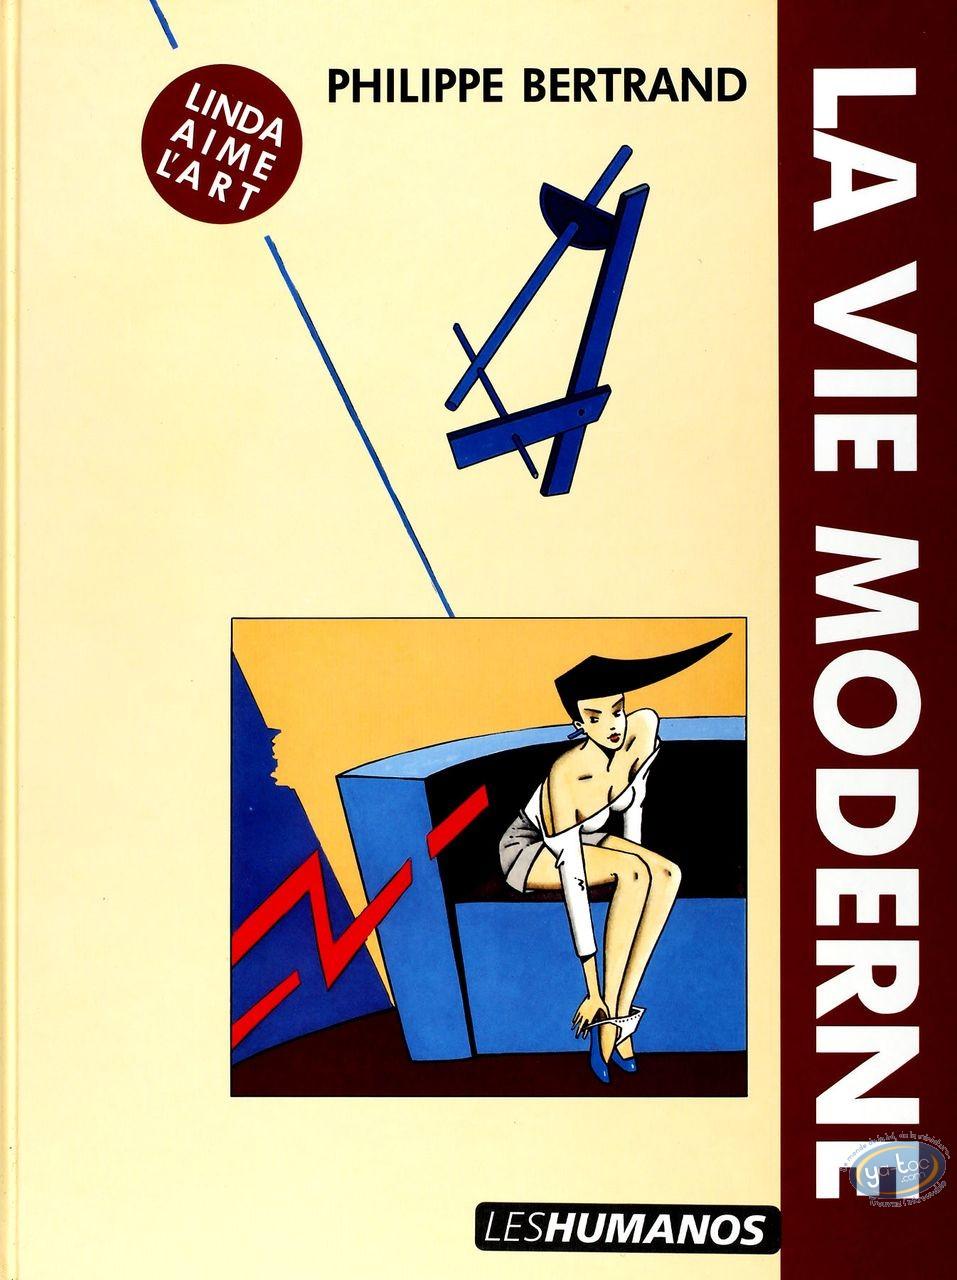 BD adultes, Linda Aime l'Art : La vie Moderne